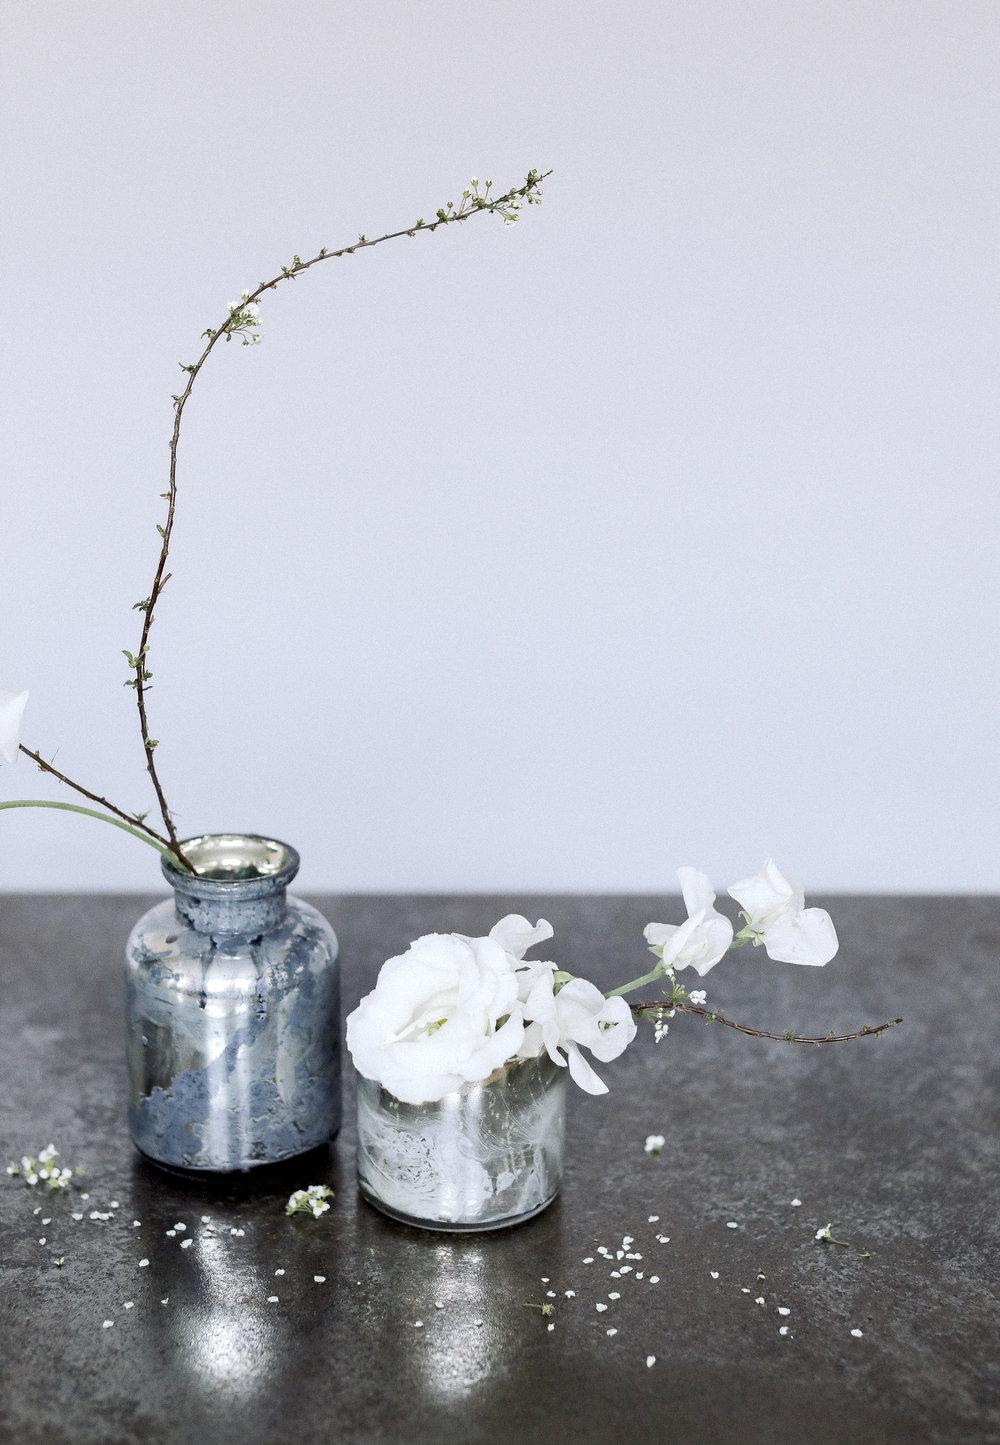 Bhldn-floral-color-story-Alandra-Michelle-38.jpg